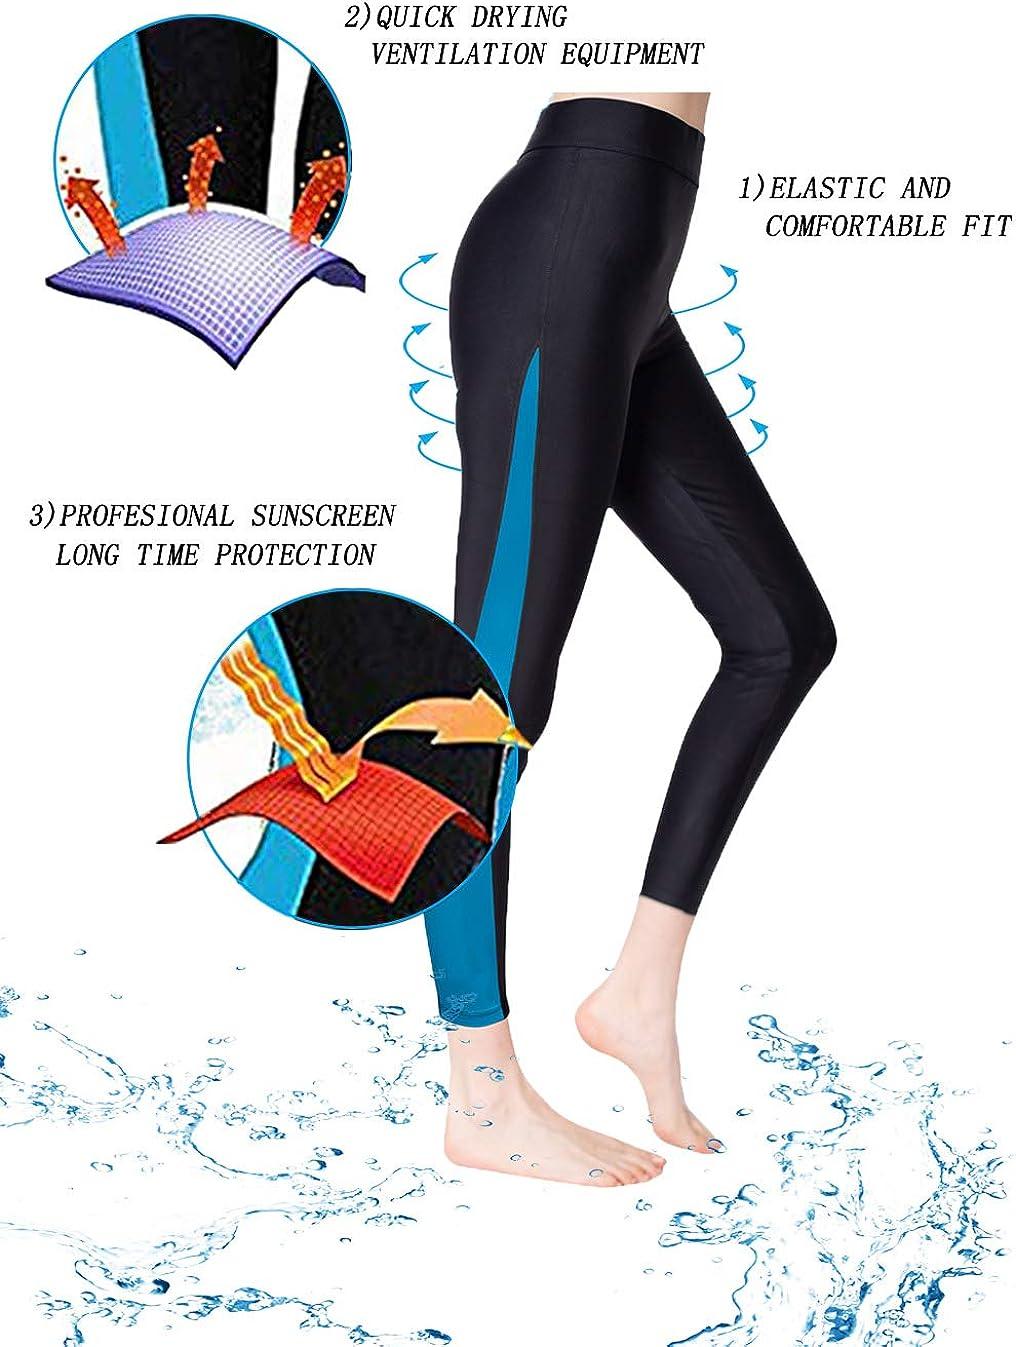 king sun exercise Womens Surfing Leggings Swimming Sport Tights UPF 50+Yoga Pants surfingpants Floating